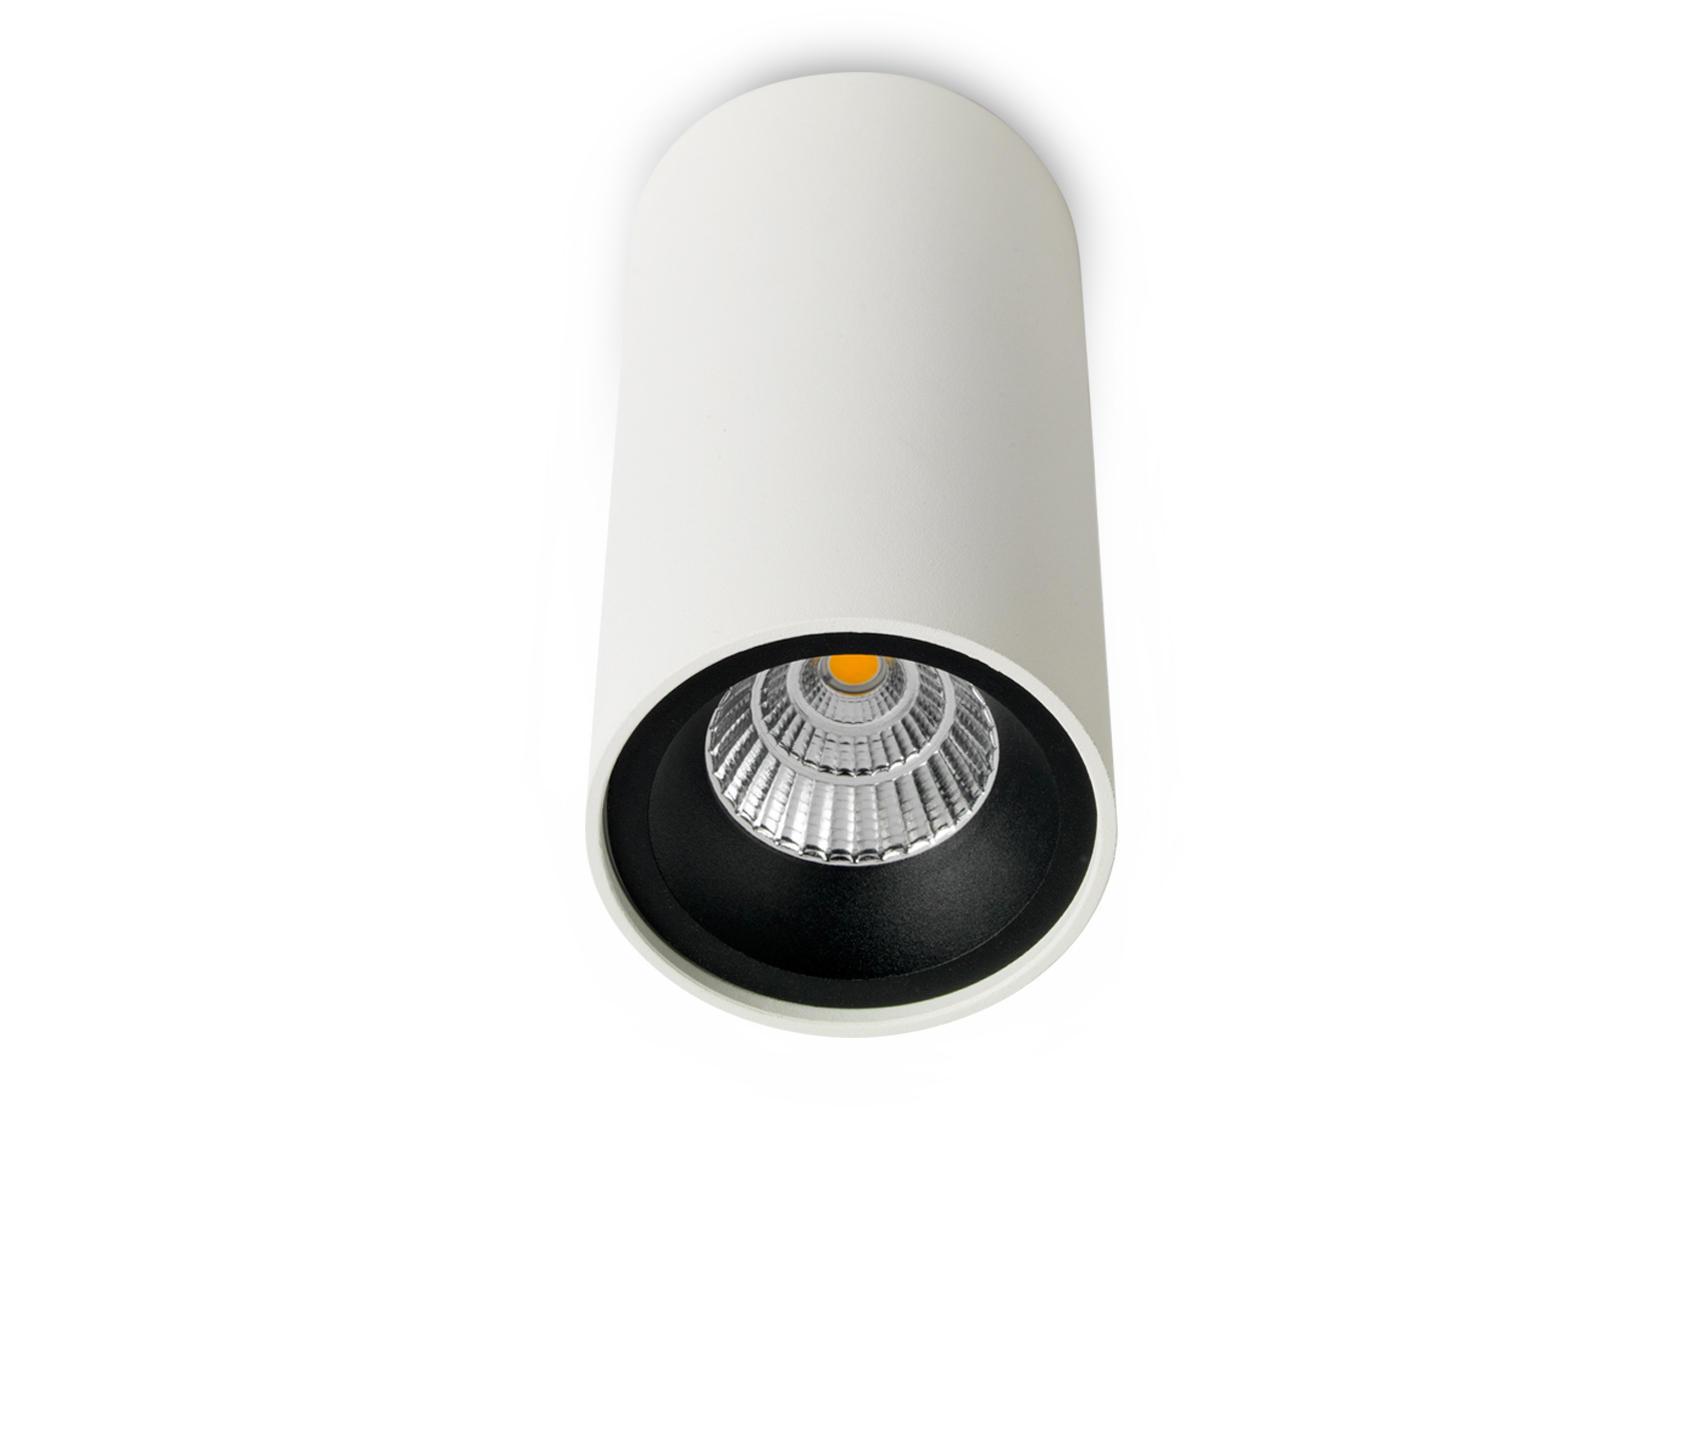 cone-border-up-1x-cone-cob-led-bs82371-2-cl7-30-border-cone-up-c-b Wunderschöne Test Led Lampen Gu10 Dekorationen